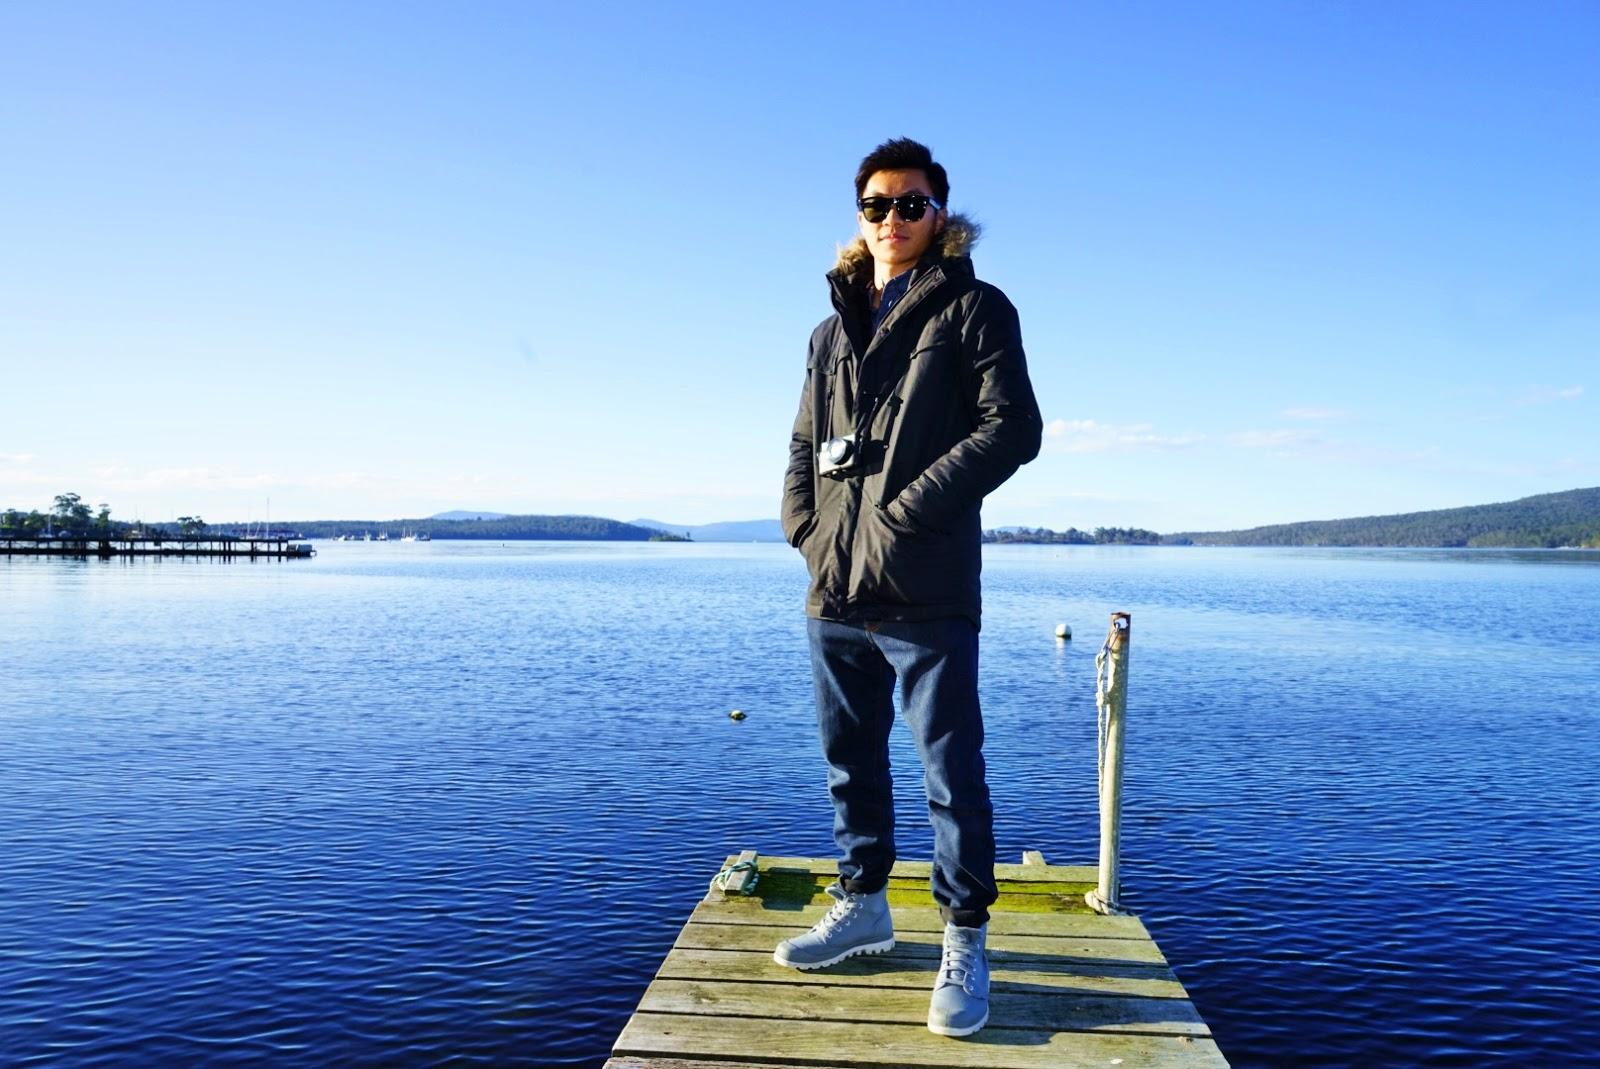 塔斯馬尼亞-景點-推薦-旅遊-自由行-澳洲-Tasmania-Tourist-Attraction-Travel-Australia